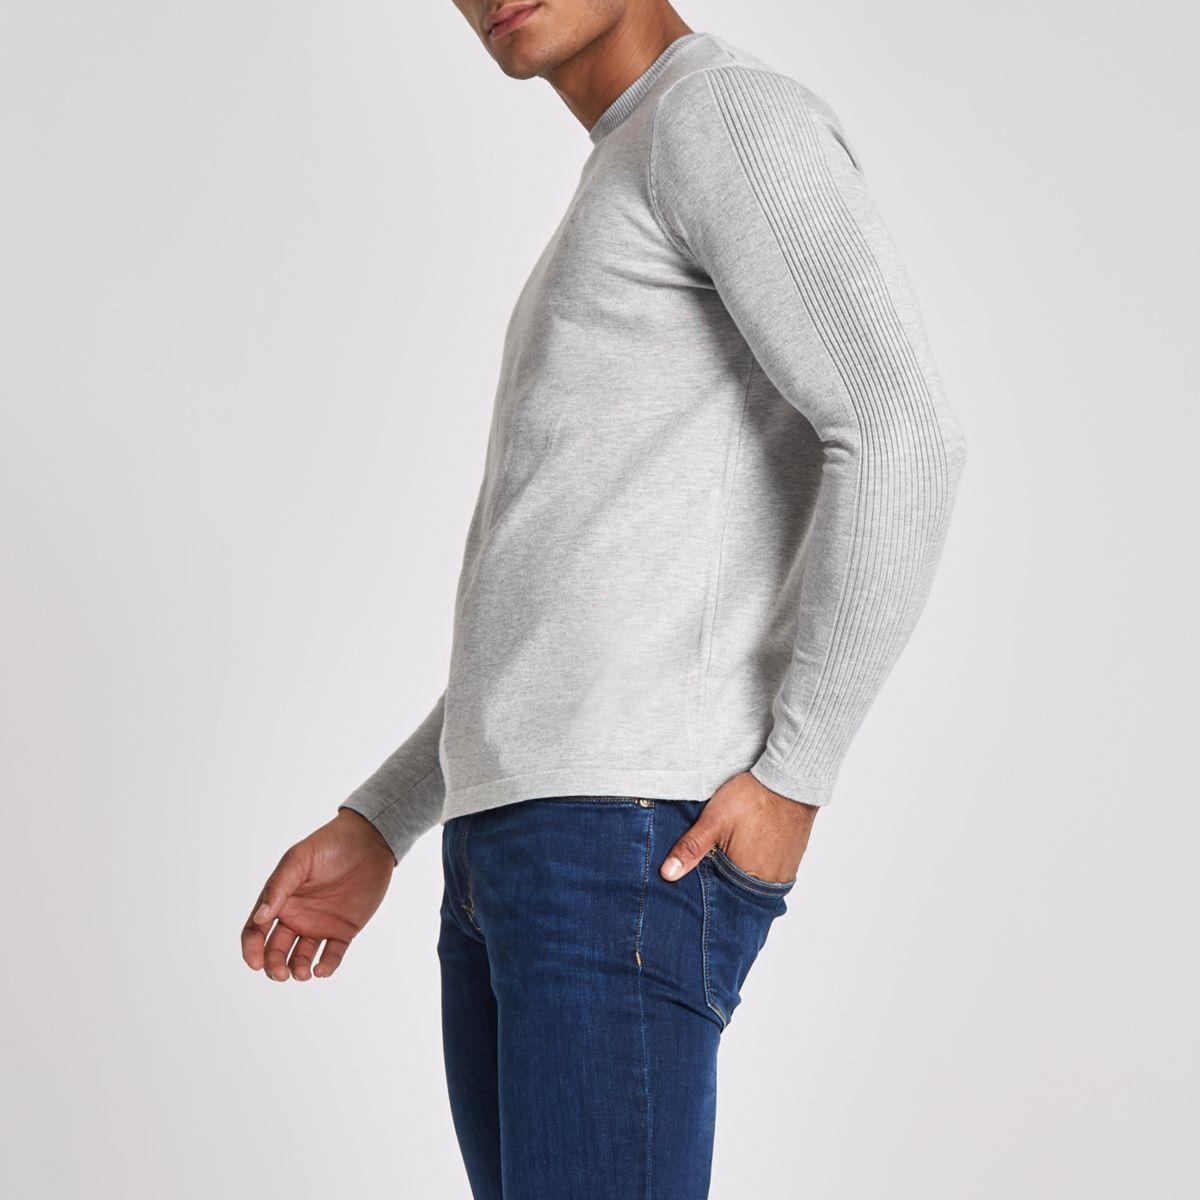 Grey 'R96' slim fit crew neck sweater